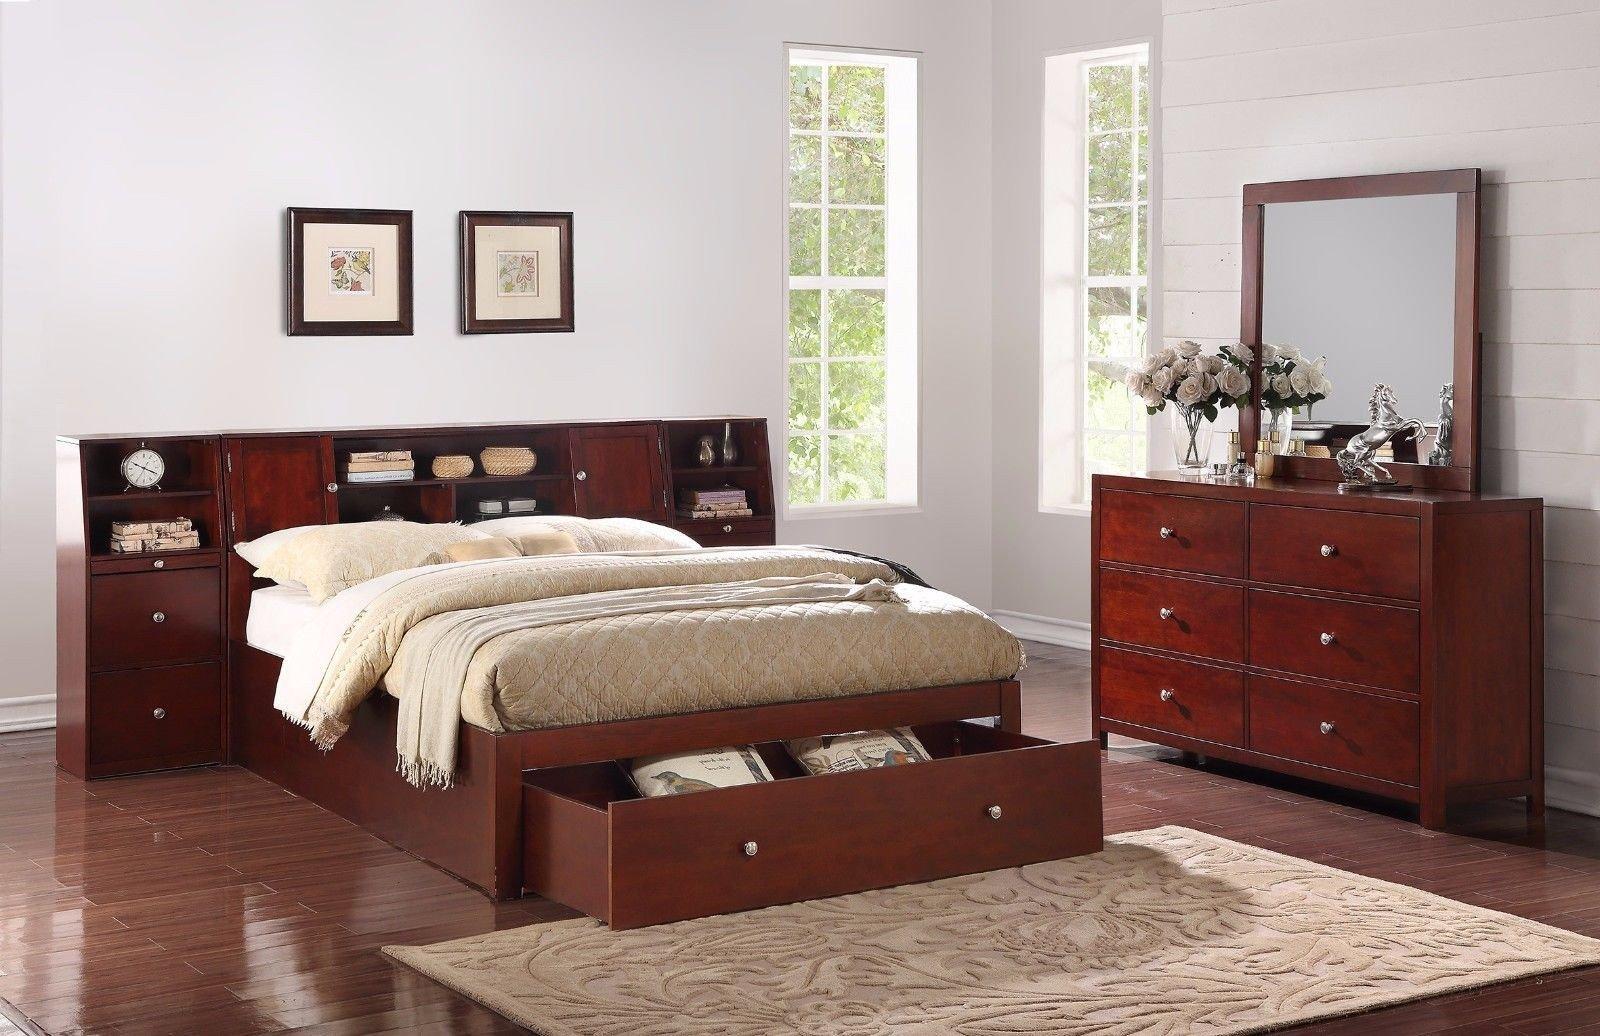 Bedroom Furniture Set Cheap Inspirational Bedroom 4pc Set Queen Bed W Storage Drawer Shelf Nightstand